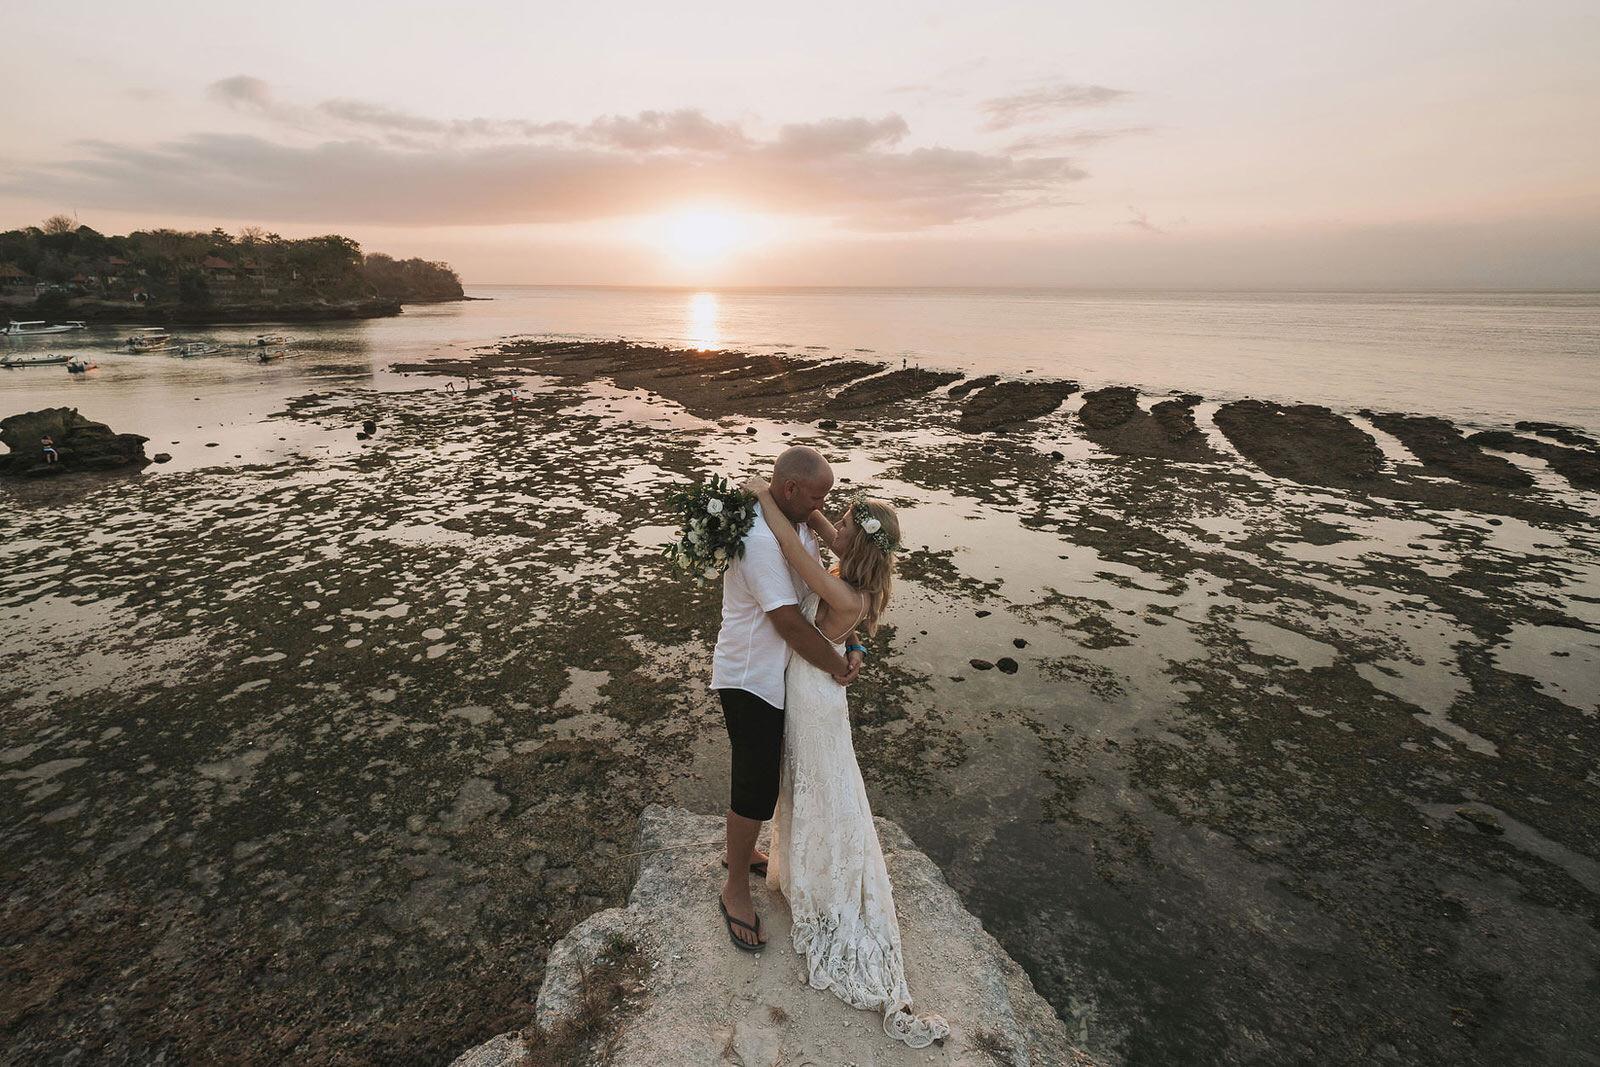 newfound-hai-tide-nusa-lembongan-bali-wedding-photographers-132